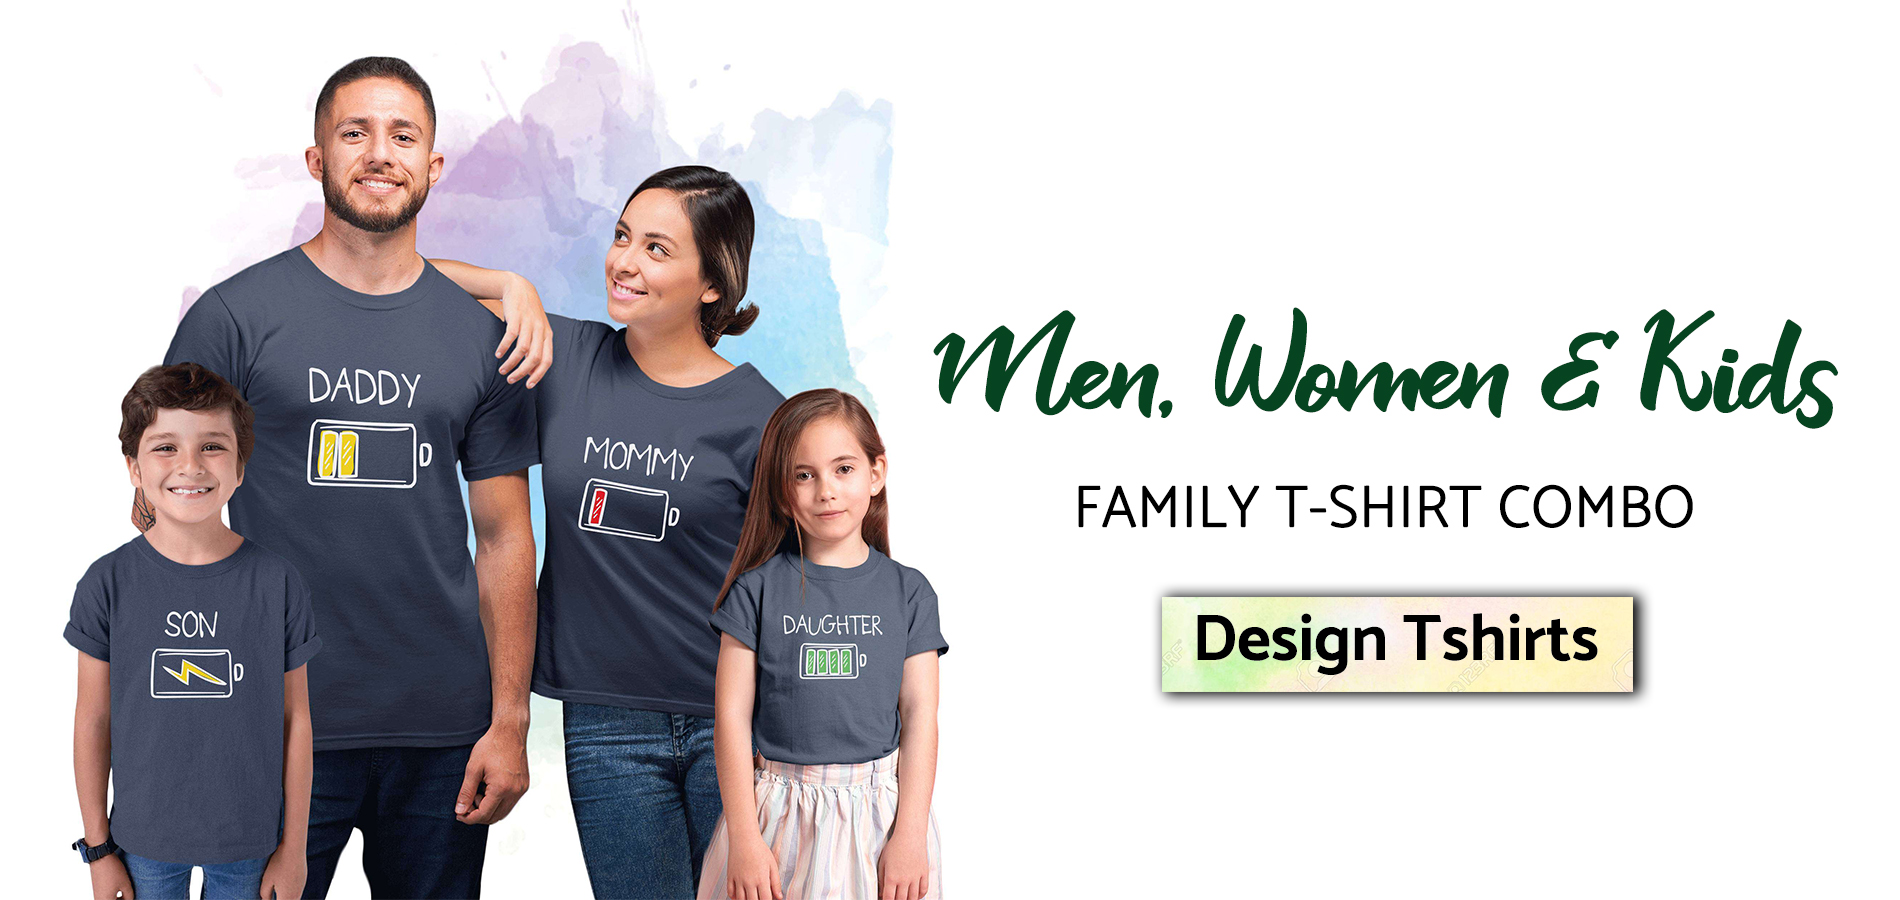 men women kids, Custom T-shirt printing